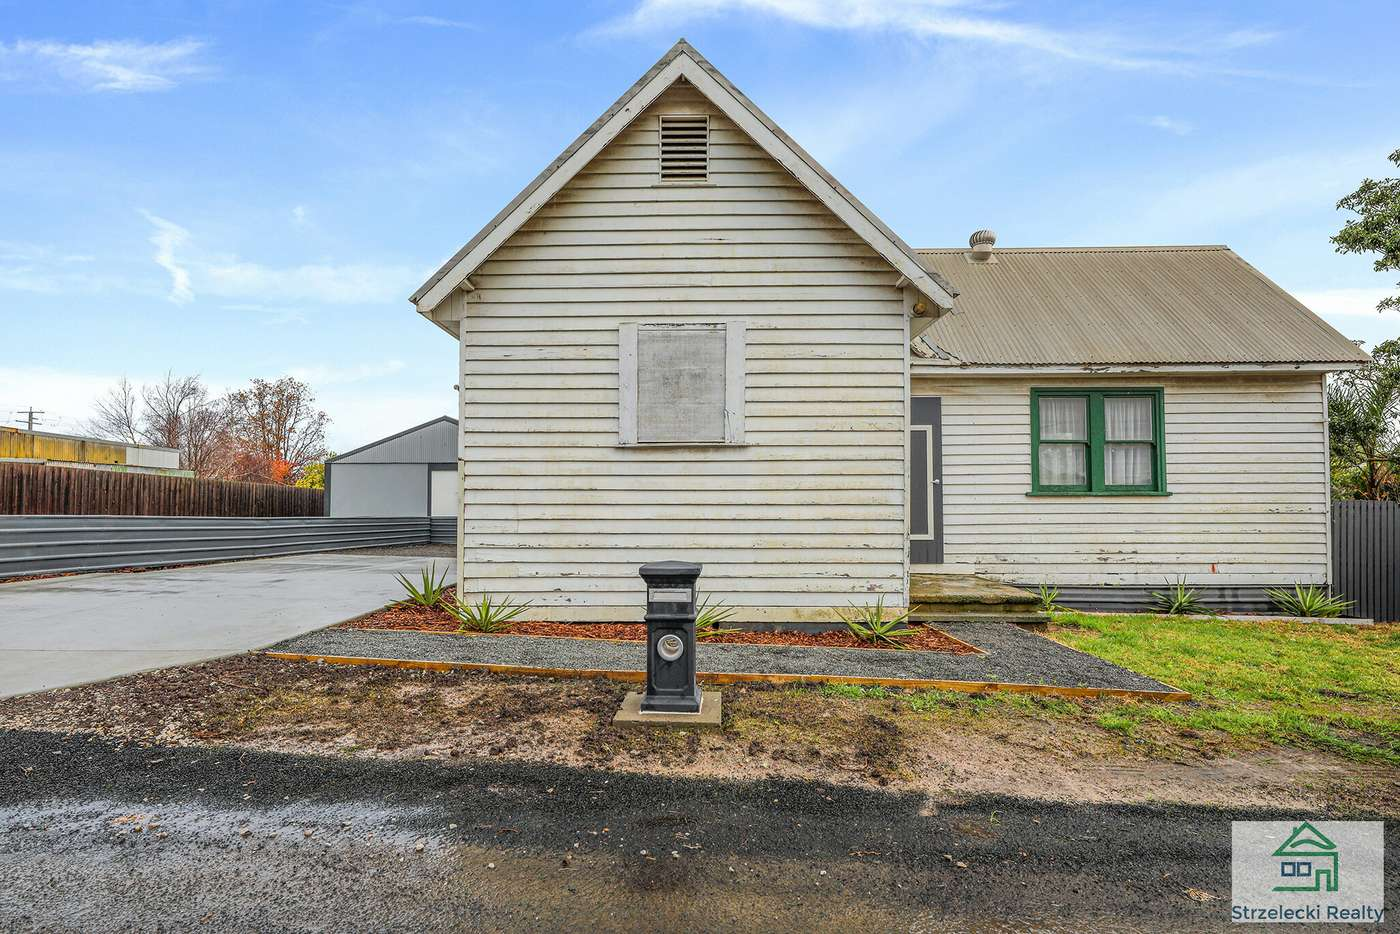 Main view of Homely house listing, 3/3 Luke Street, Moe VIC 3825